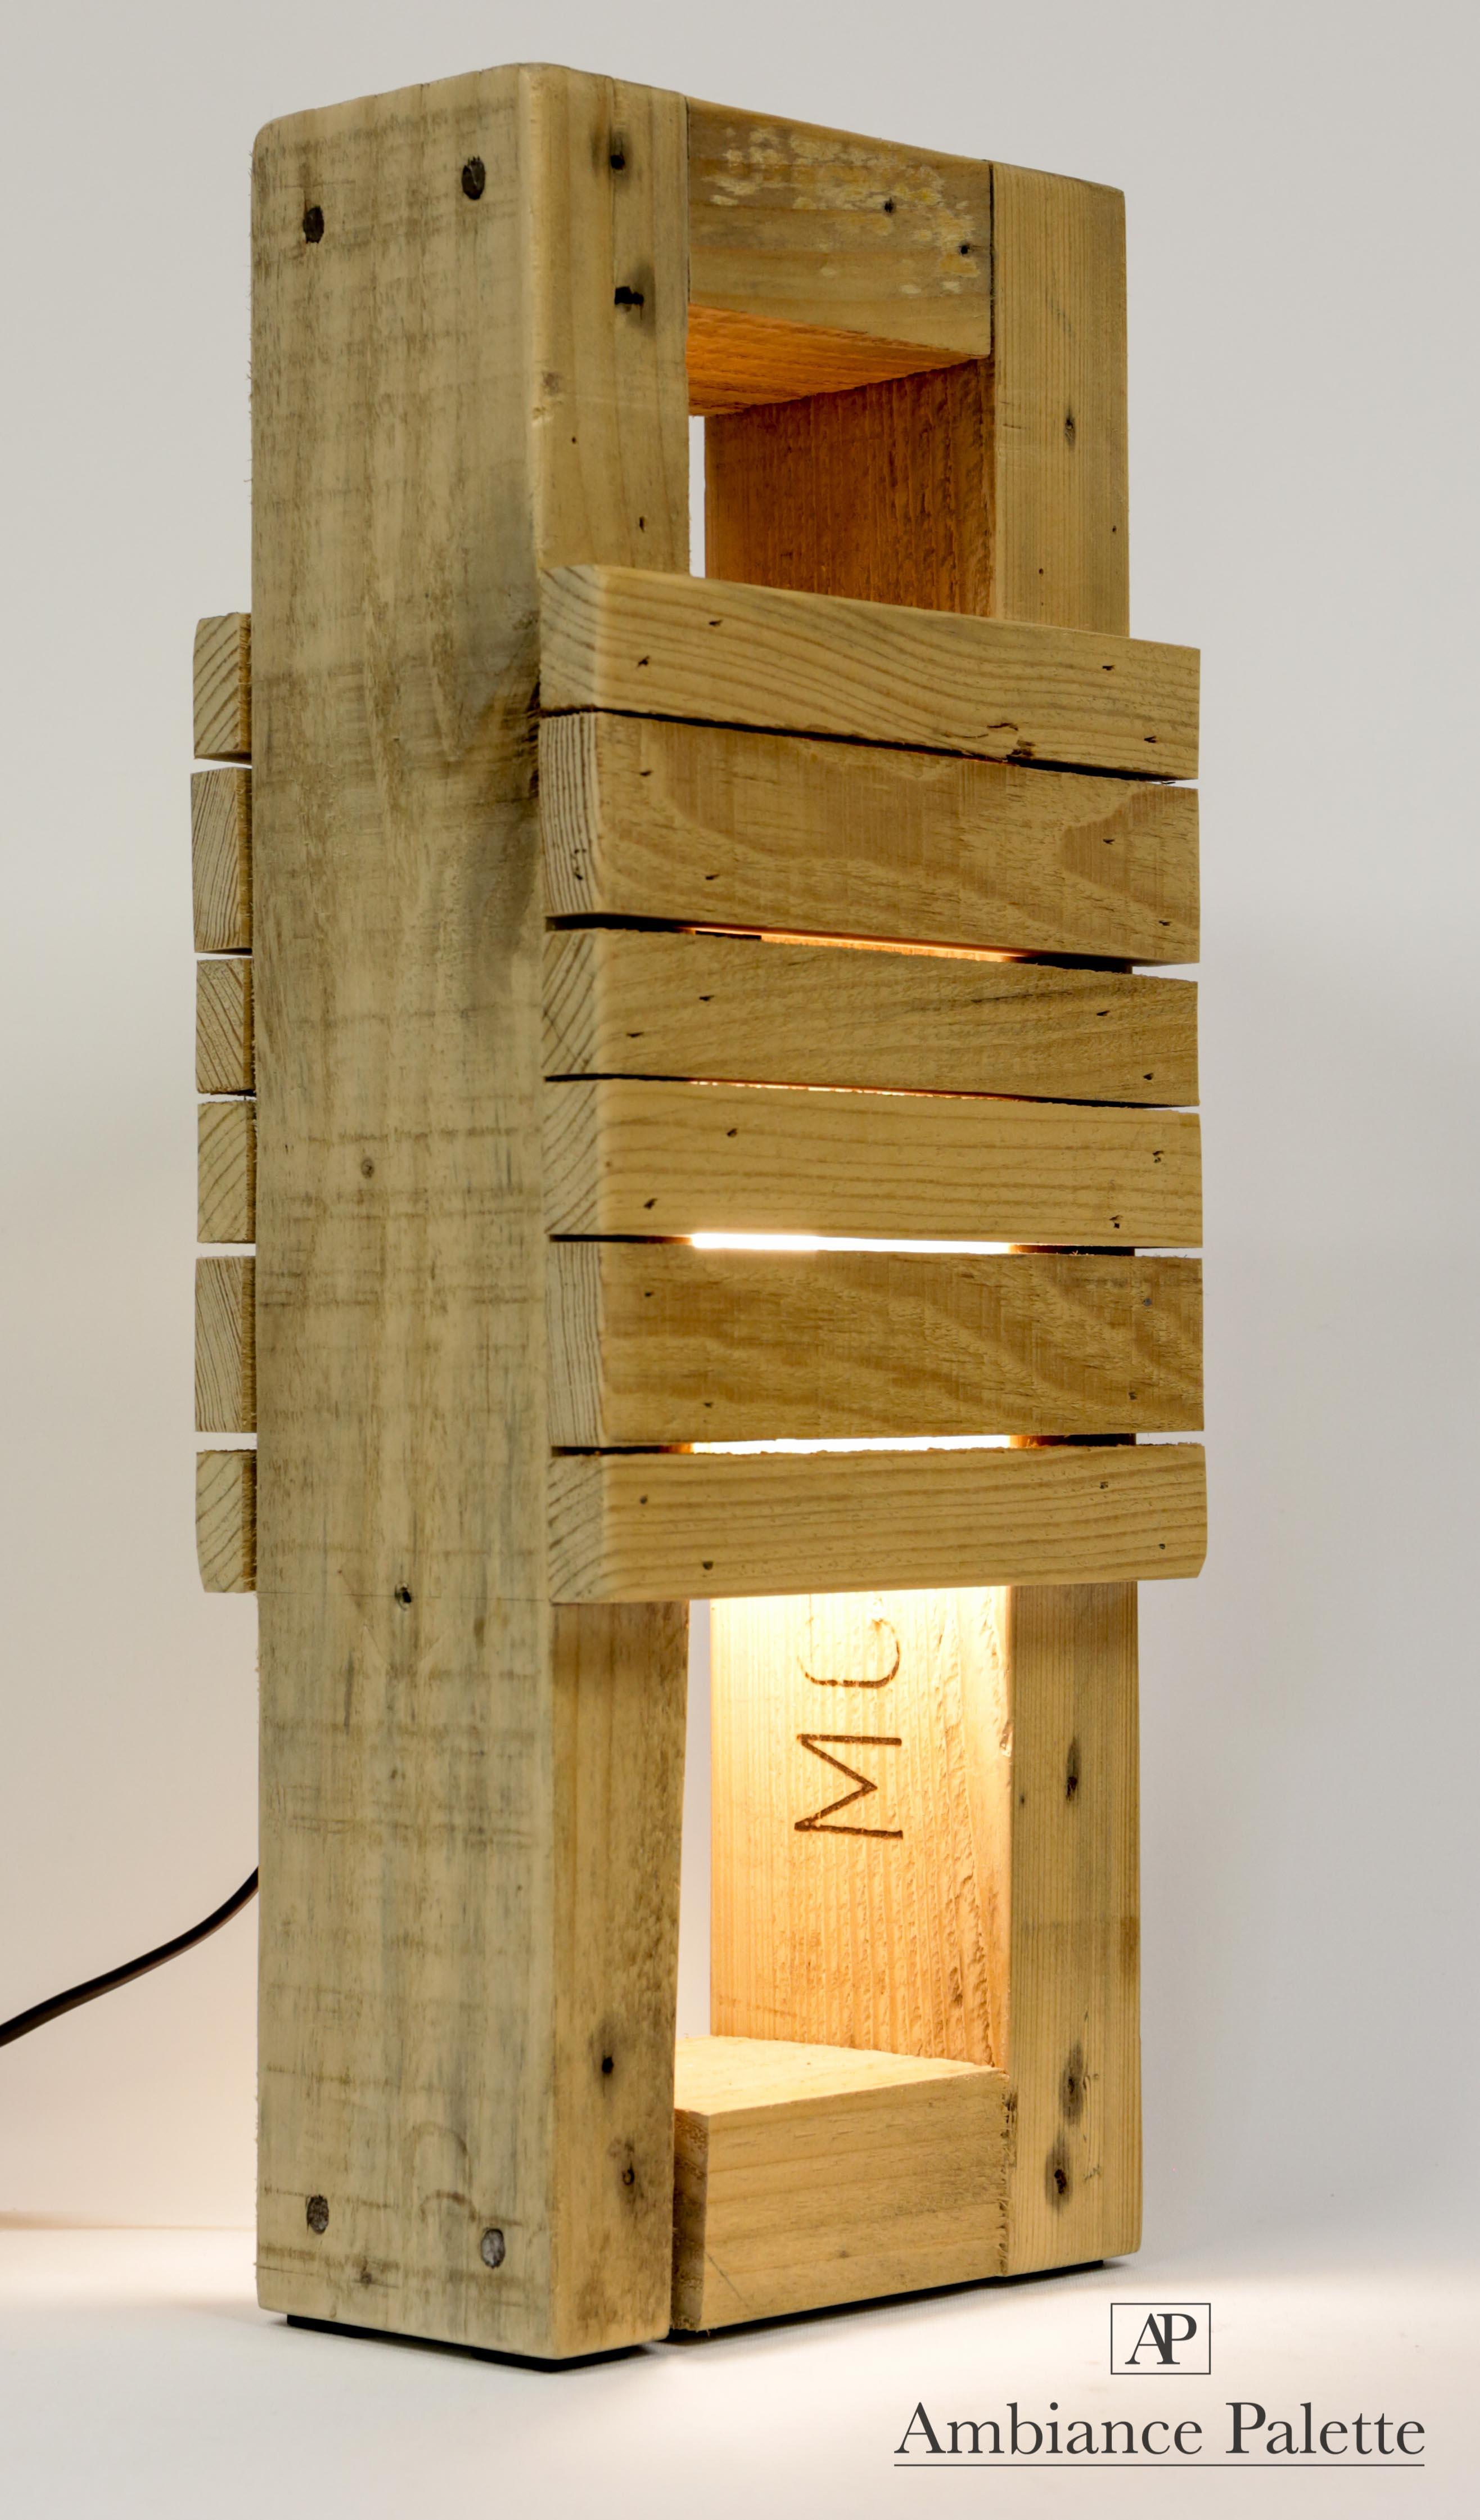 Lampe Bois Design 1 Ambiance Palette